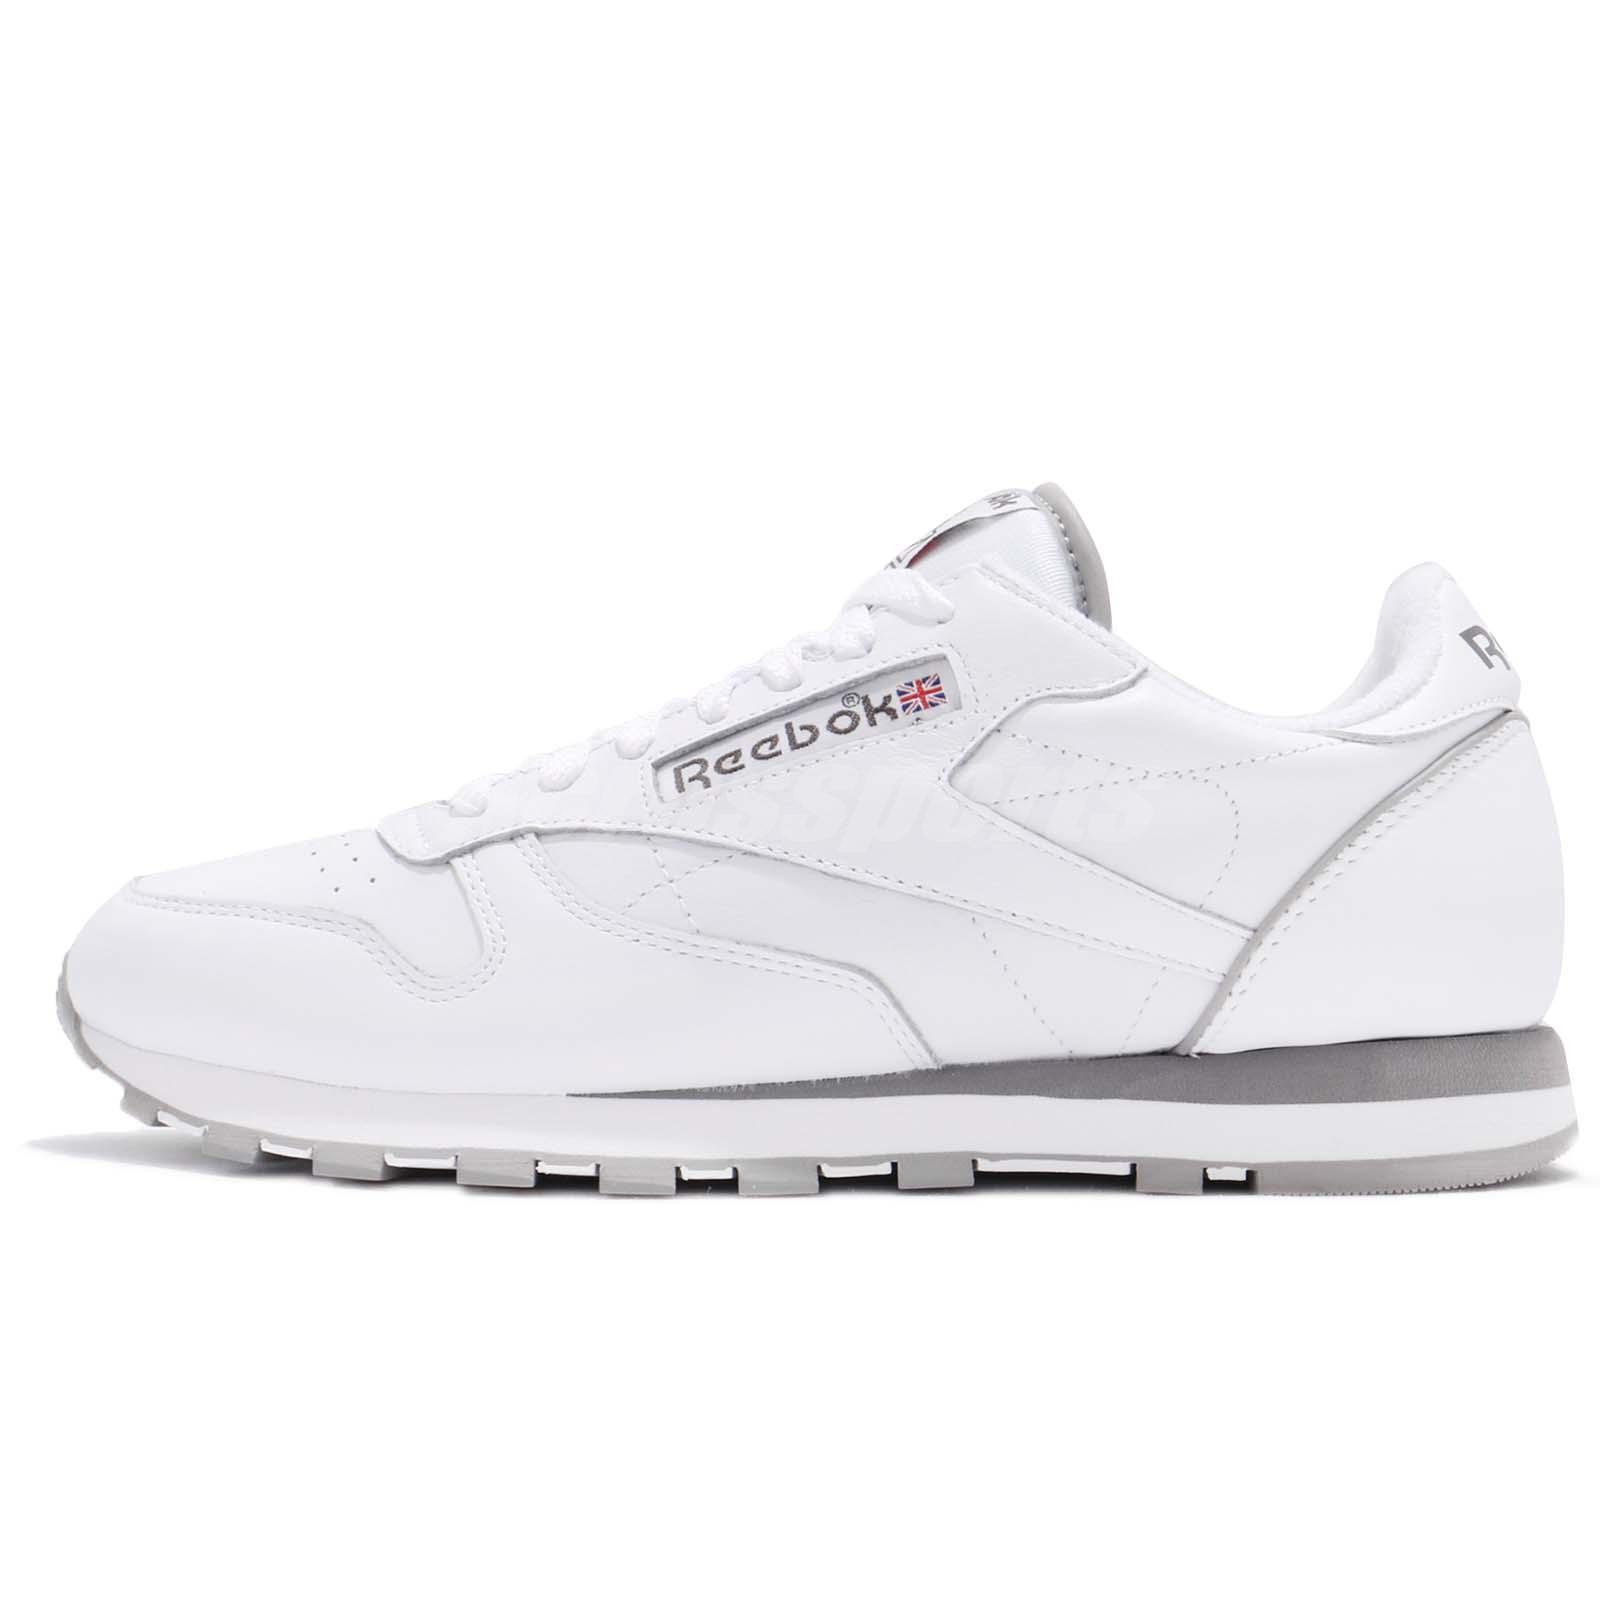 4c9470280f2 Reebok Classic CL Leather Archive White Carbon Grey Men Shoes Sneakers  CM9670